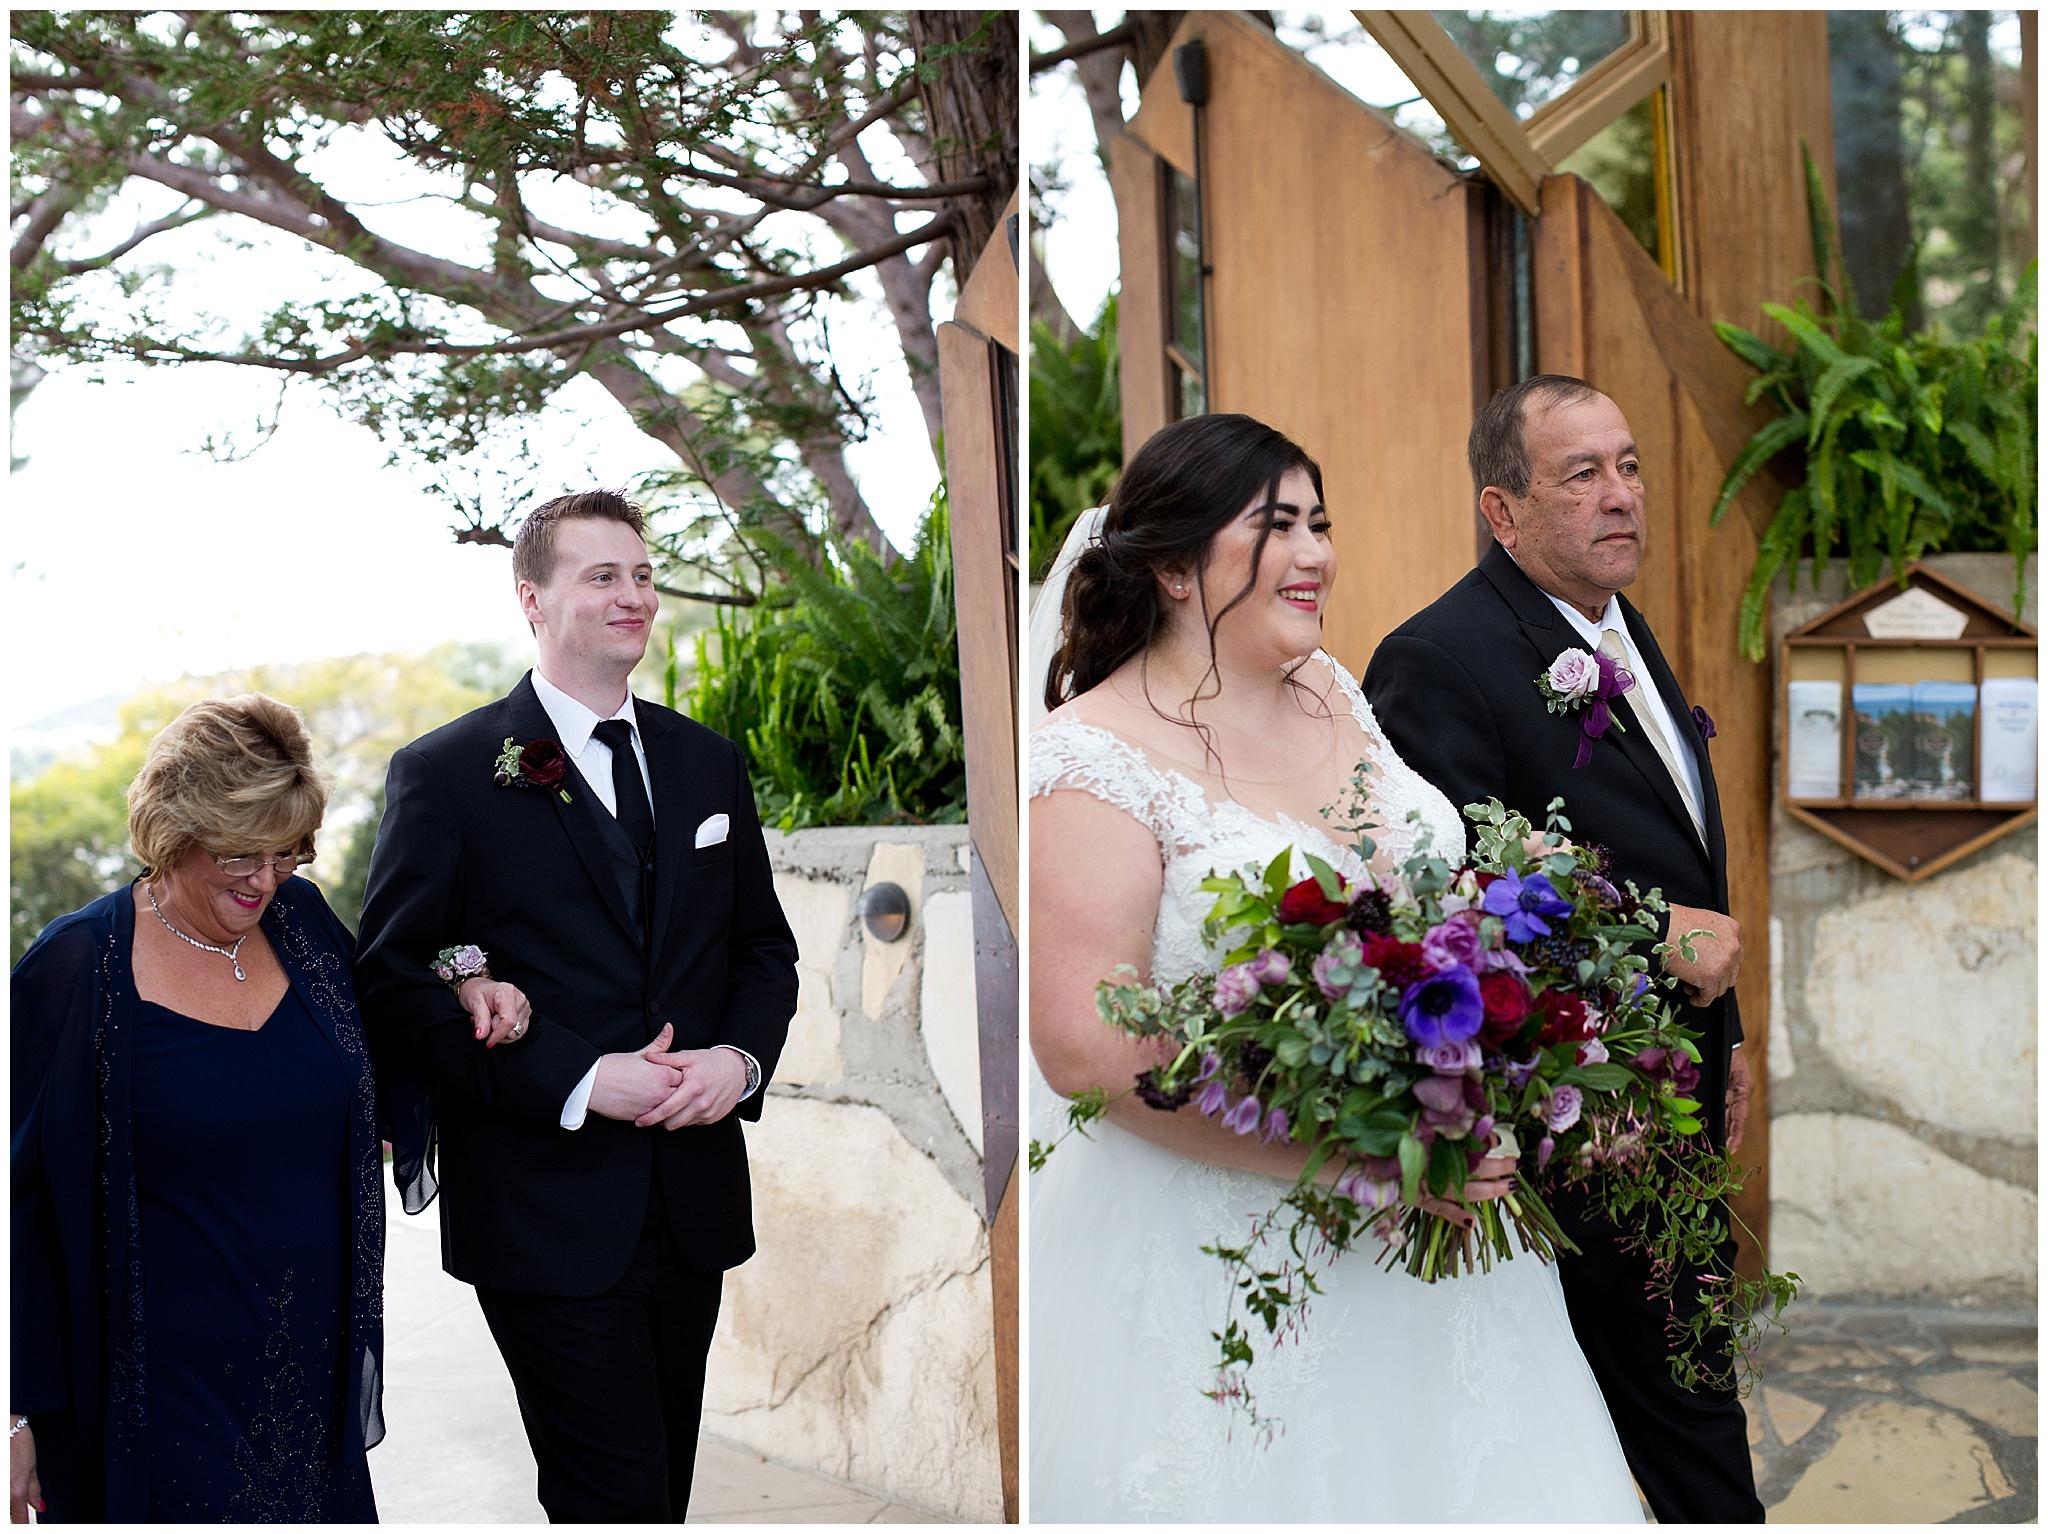 Carol_and_Grant_Wedding_3-3-18-7941.jpg